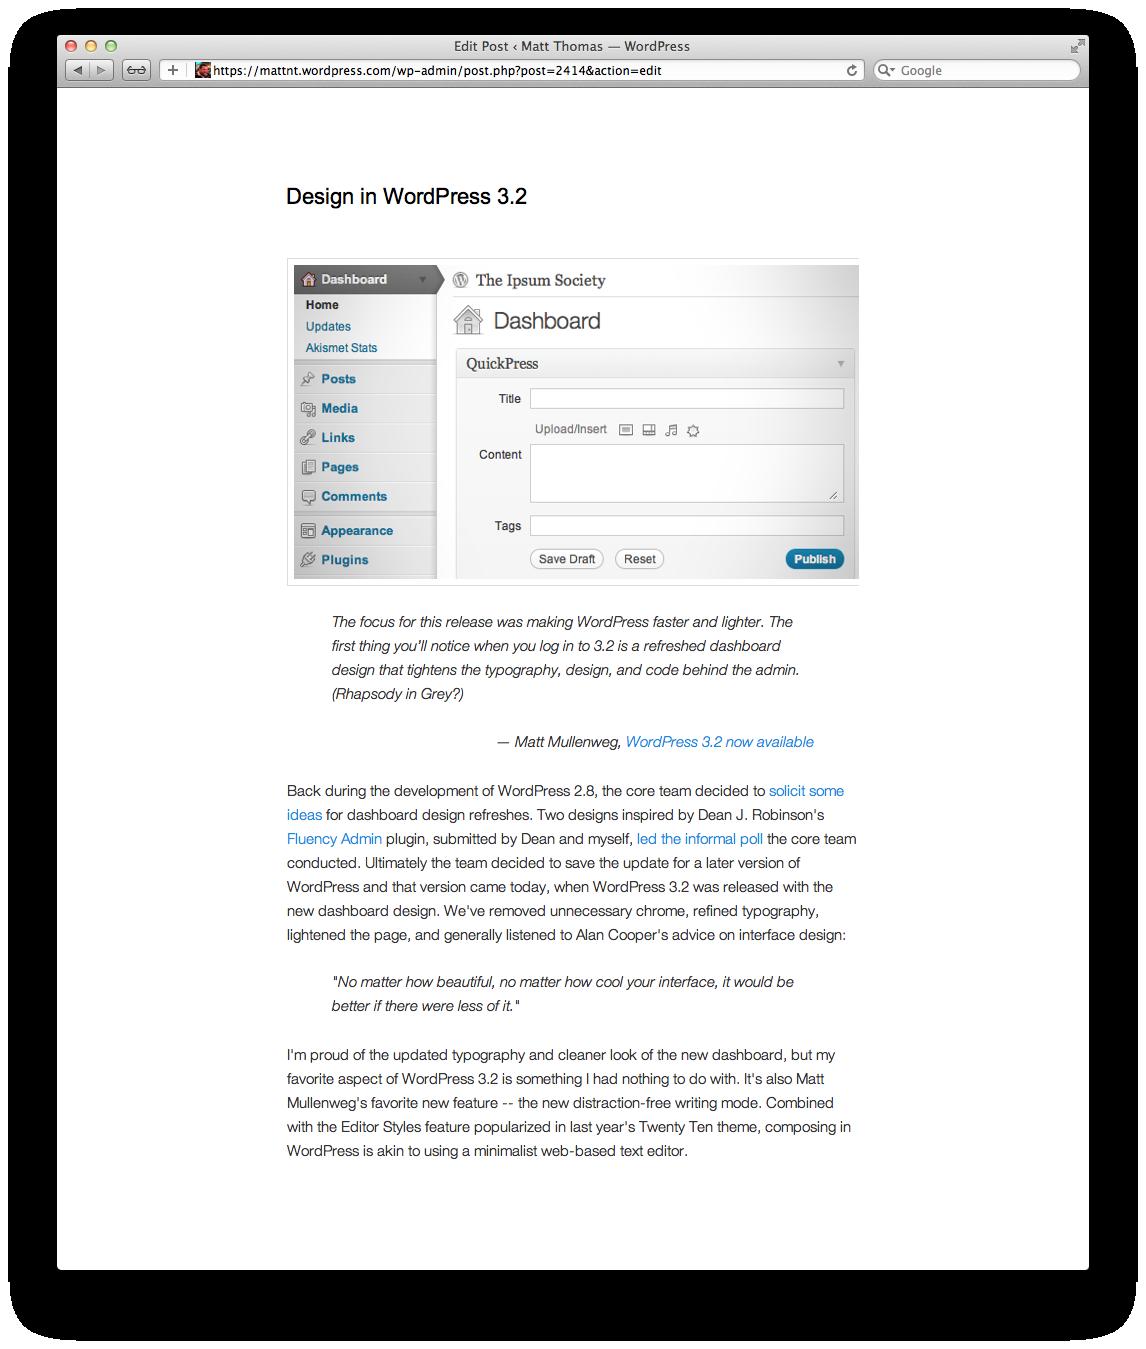 Design in WordPress 3.2 (2/2)